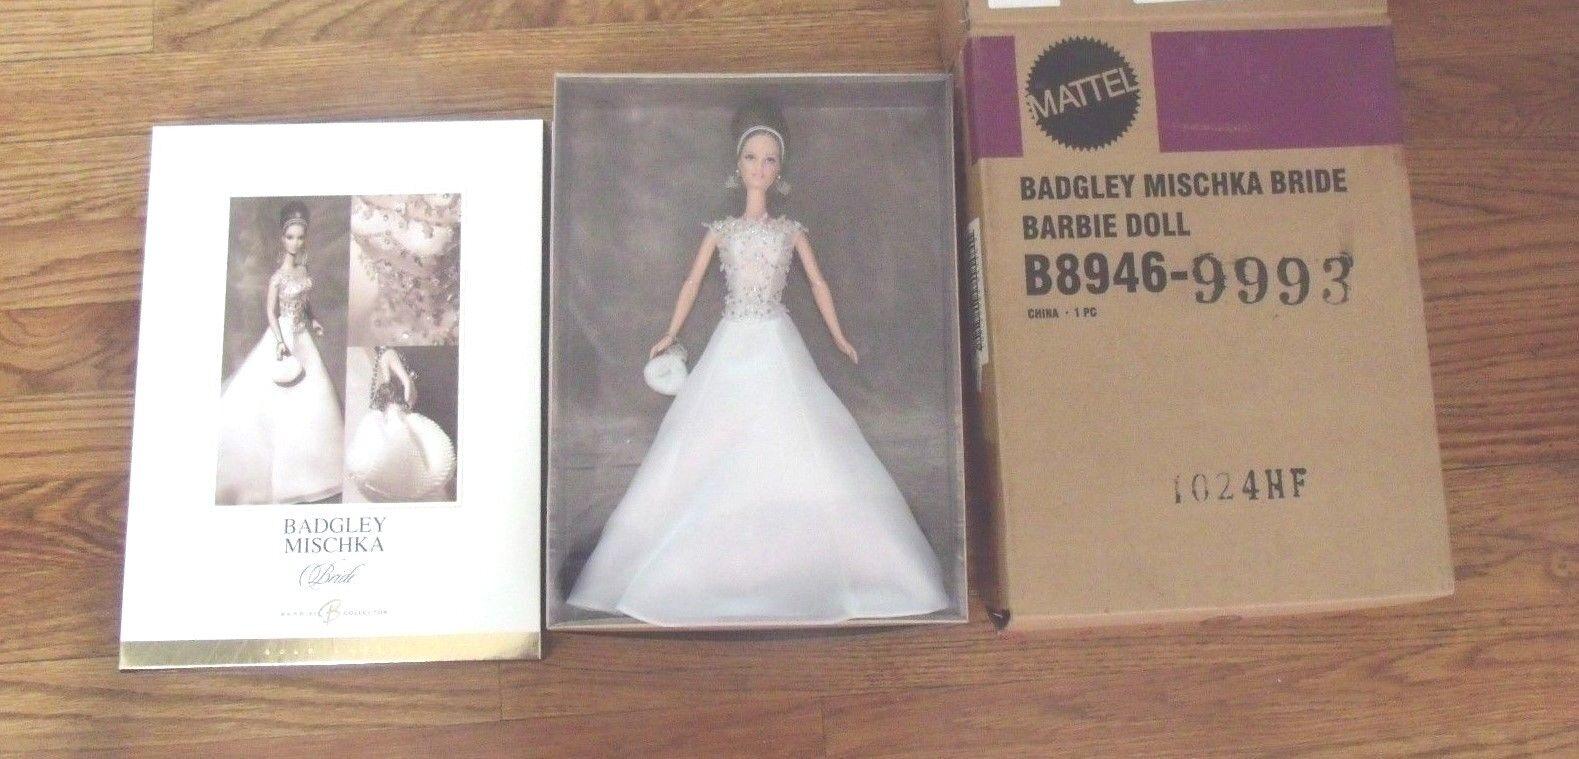 2003 Badgley Mischka Bride Barbie Gold Label